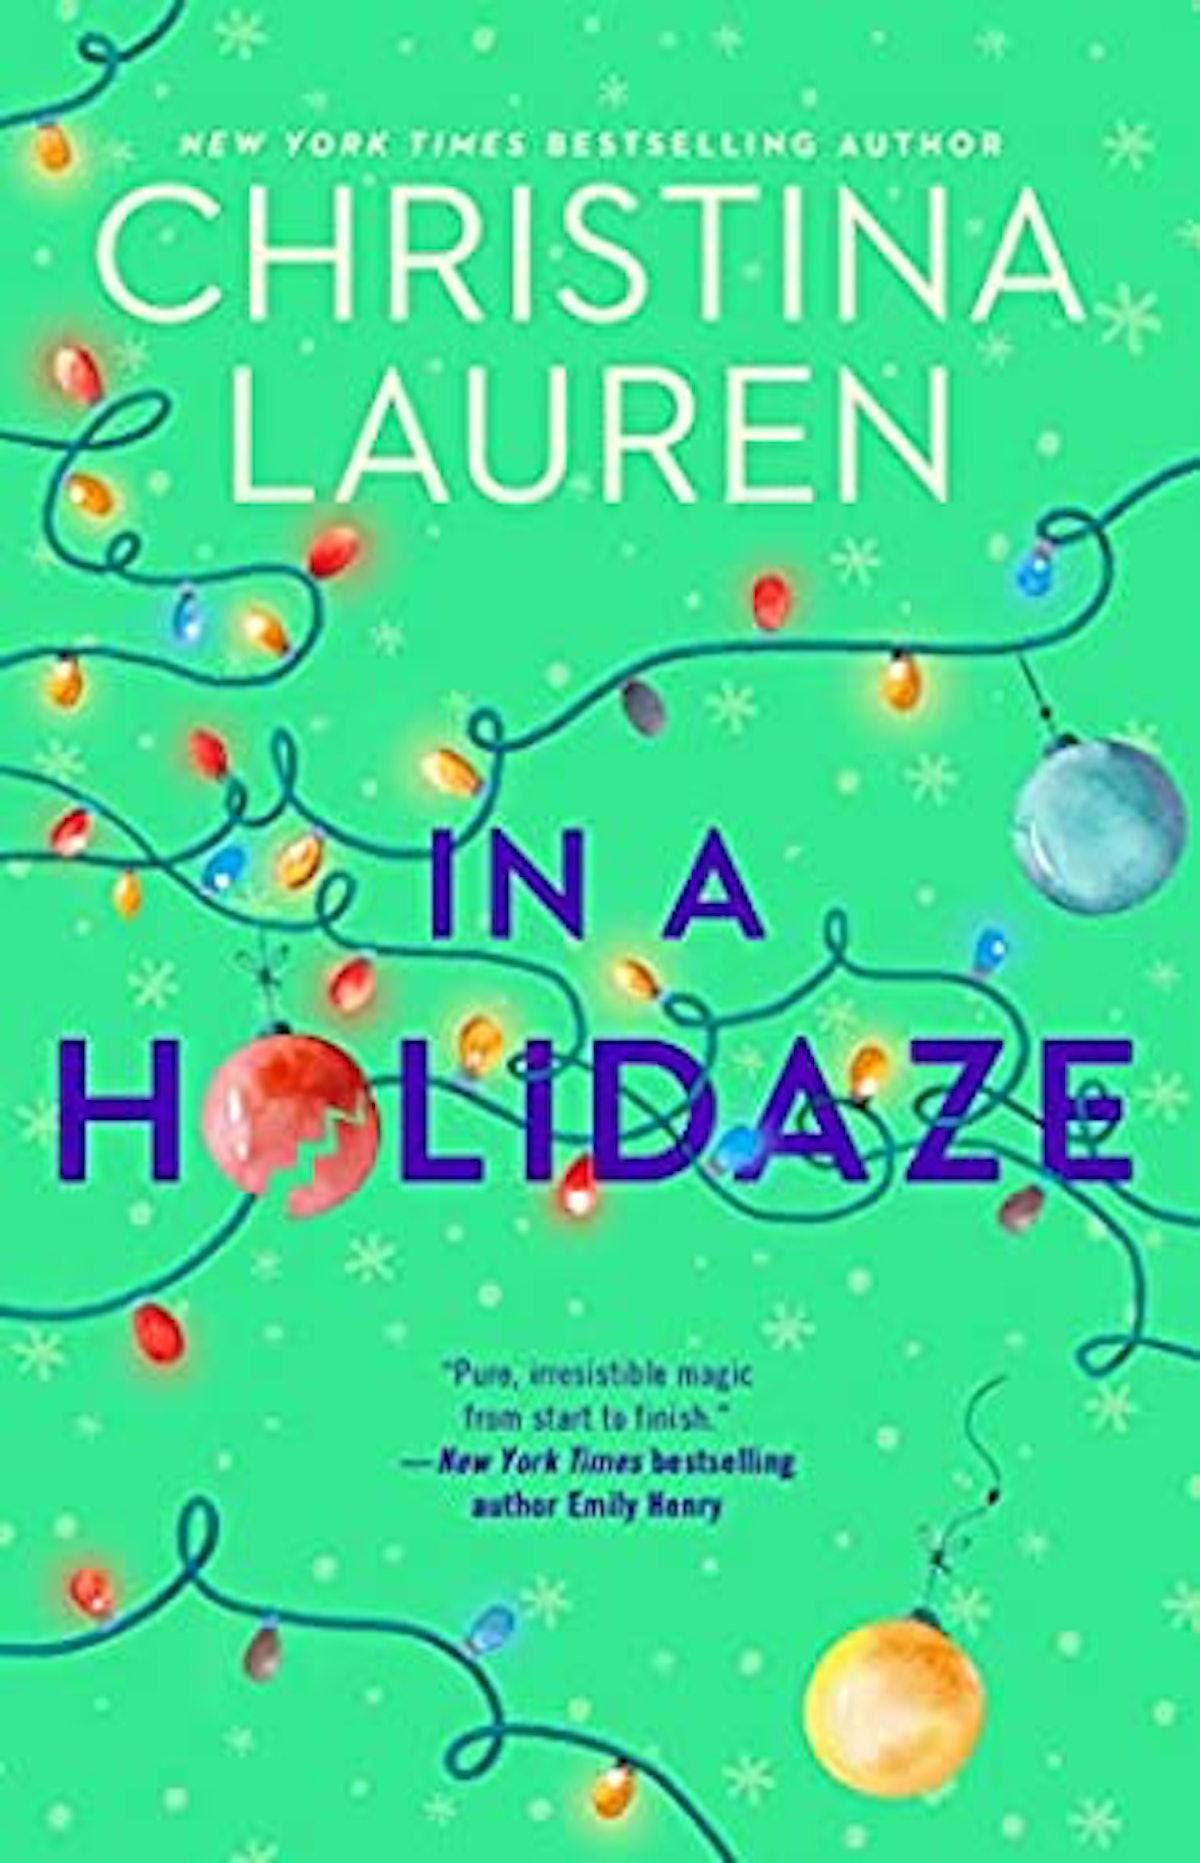 'In a Holidaze' by Christina Lauren